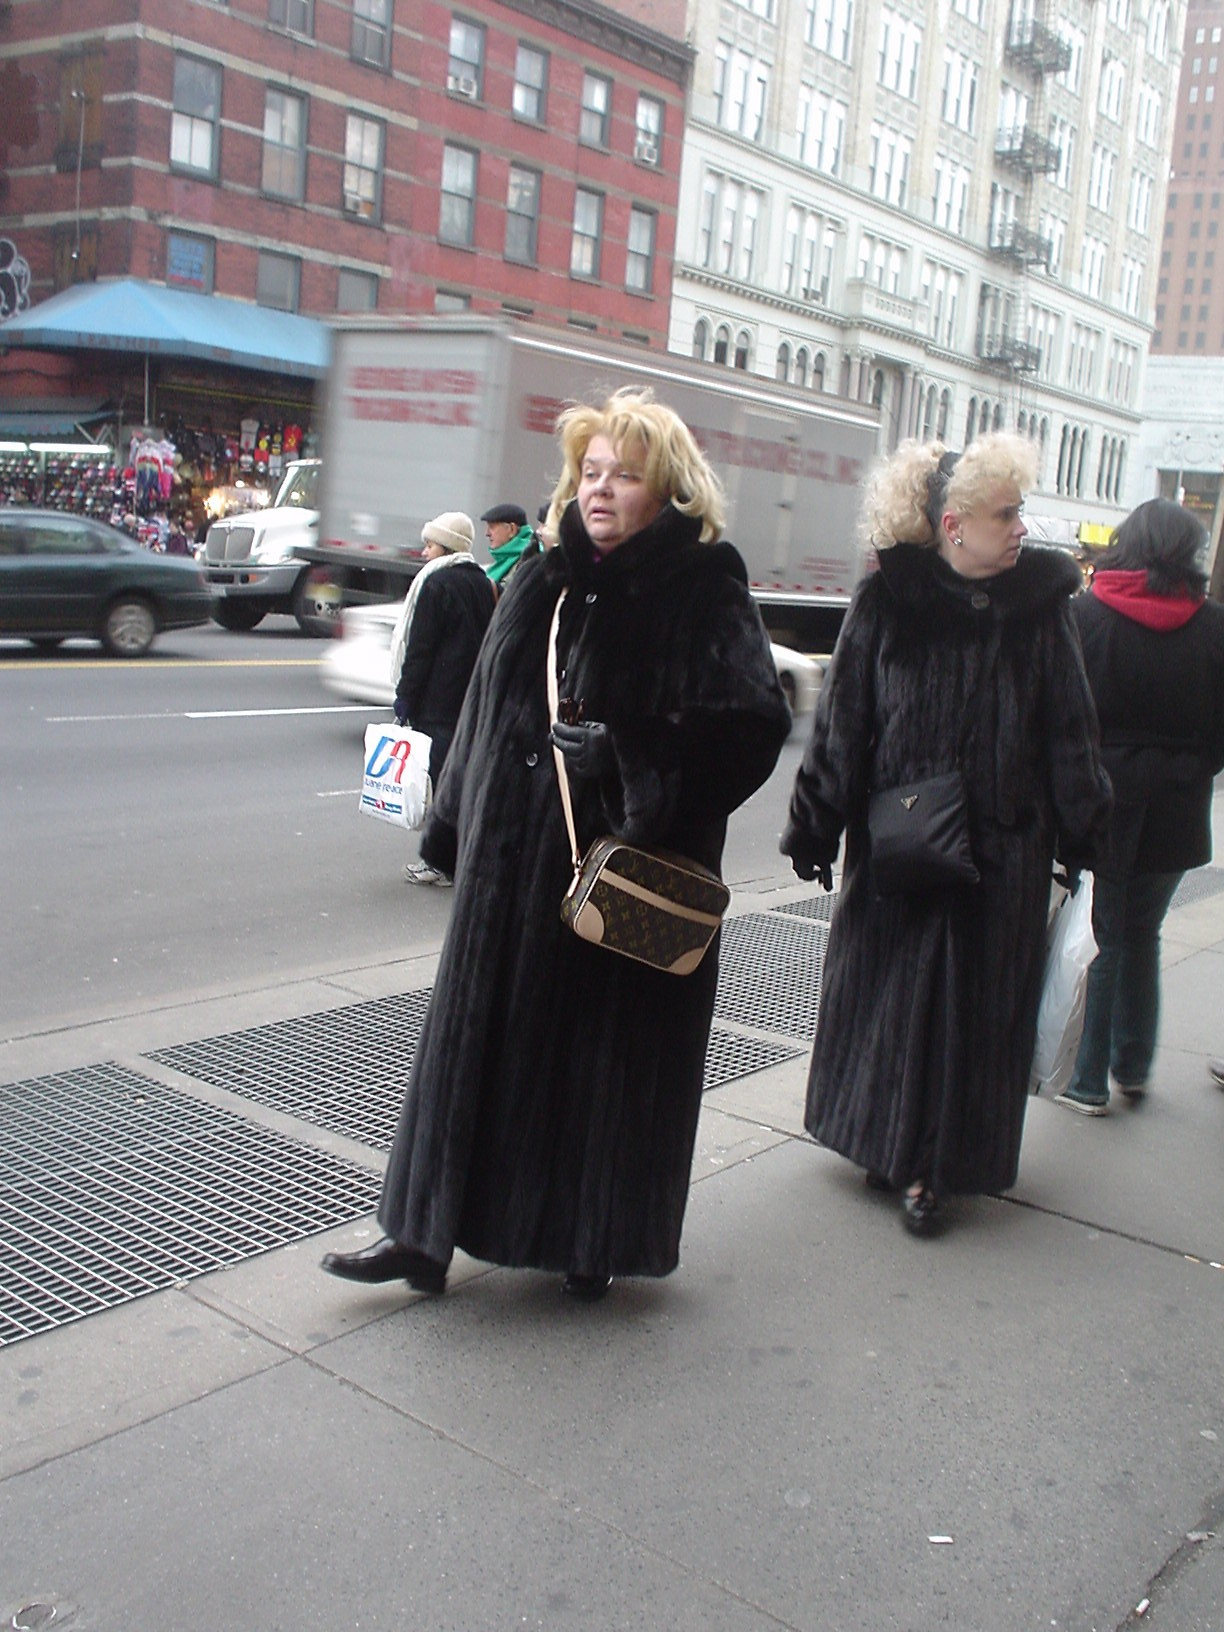 Blonde women in black fur coats